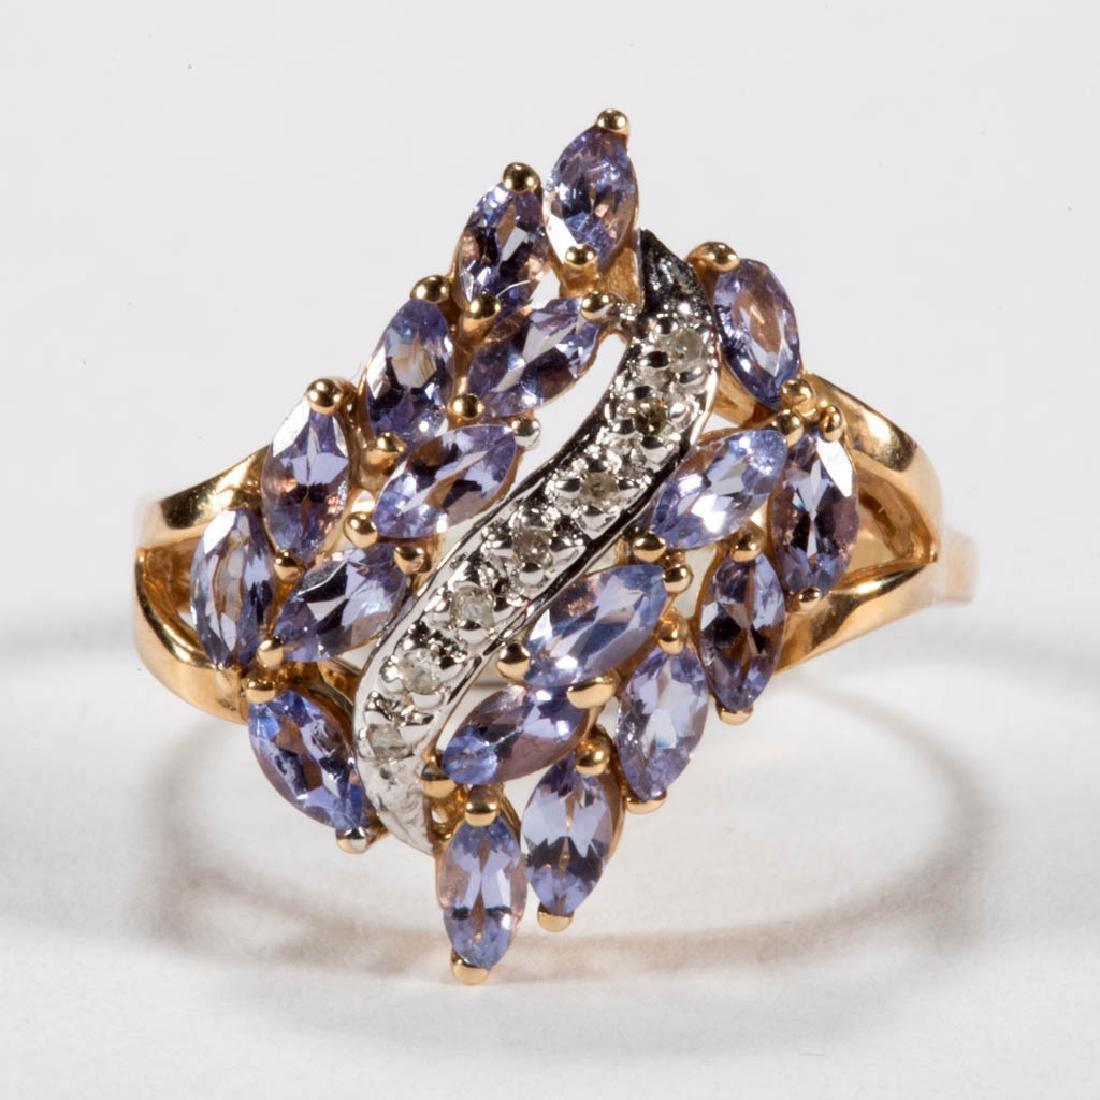 VINTAGE 14K GOLD DIAMOND AND TANZANITE LADY'S RING